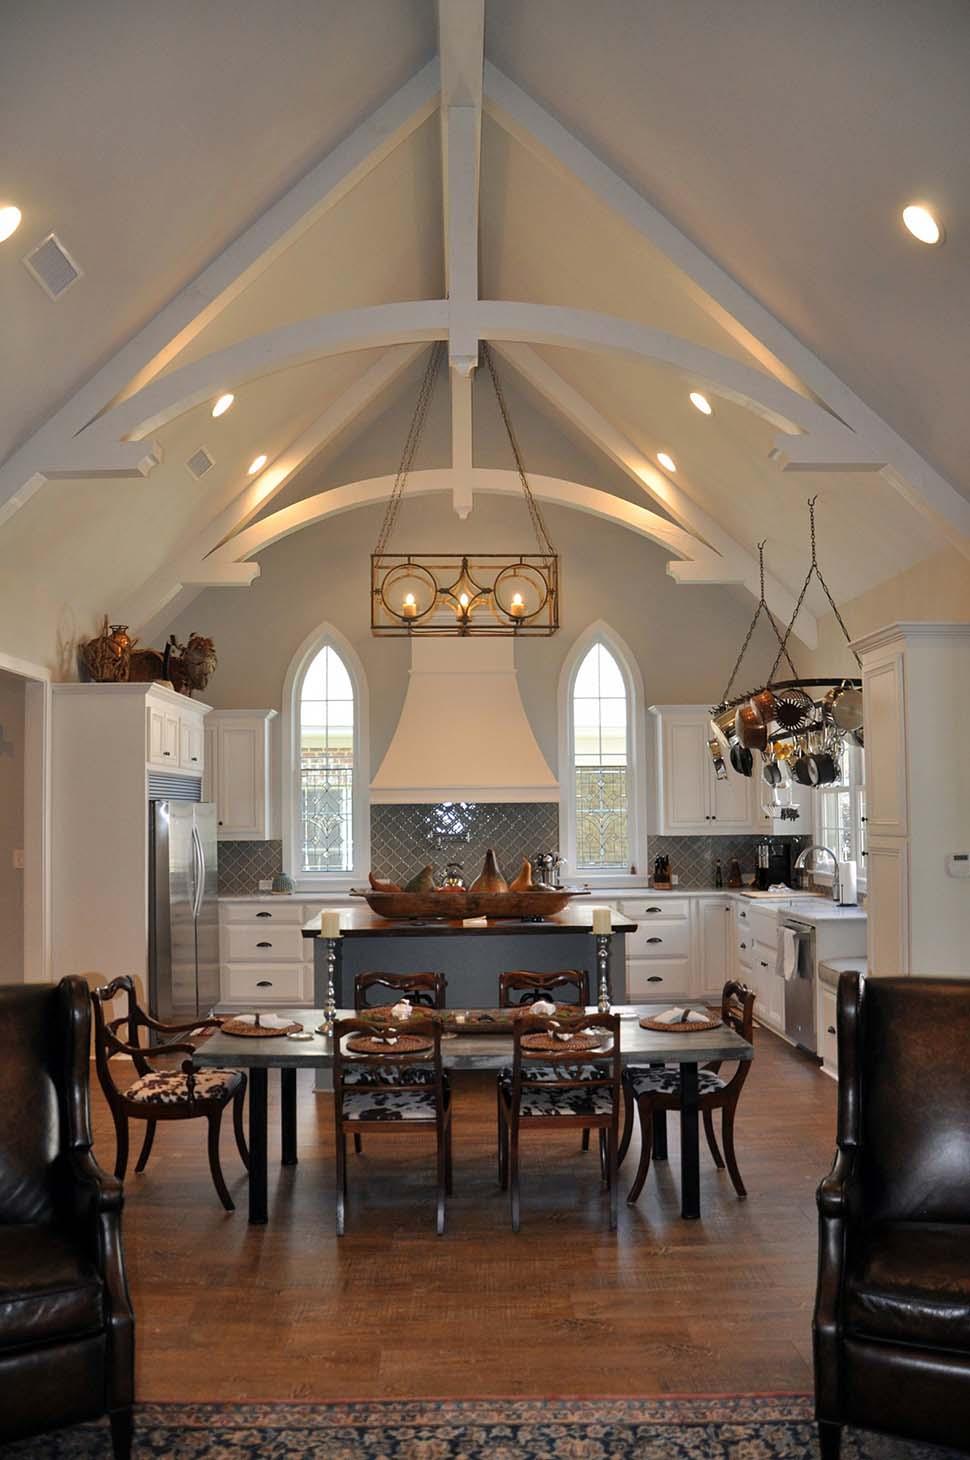 Bungalow, Cottage, Craftsman, European, Tudor House Plan 78516 with 3 Beds, 3 Baths, 2 Car Garage Picture 4